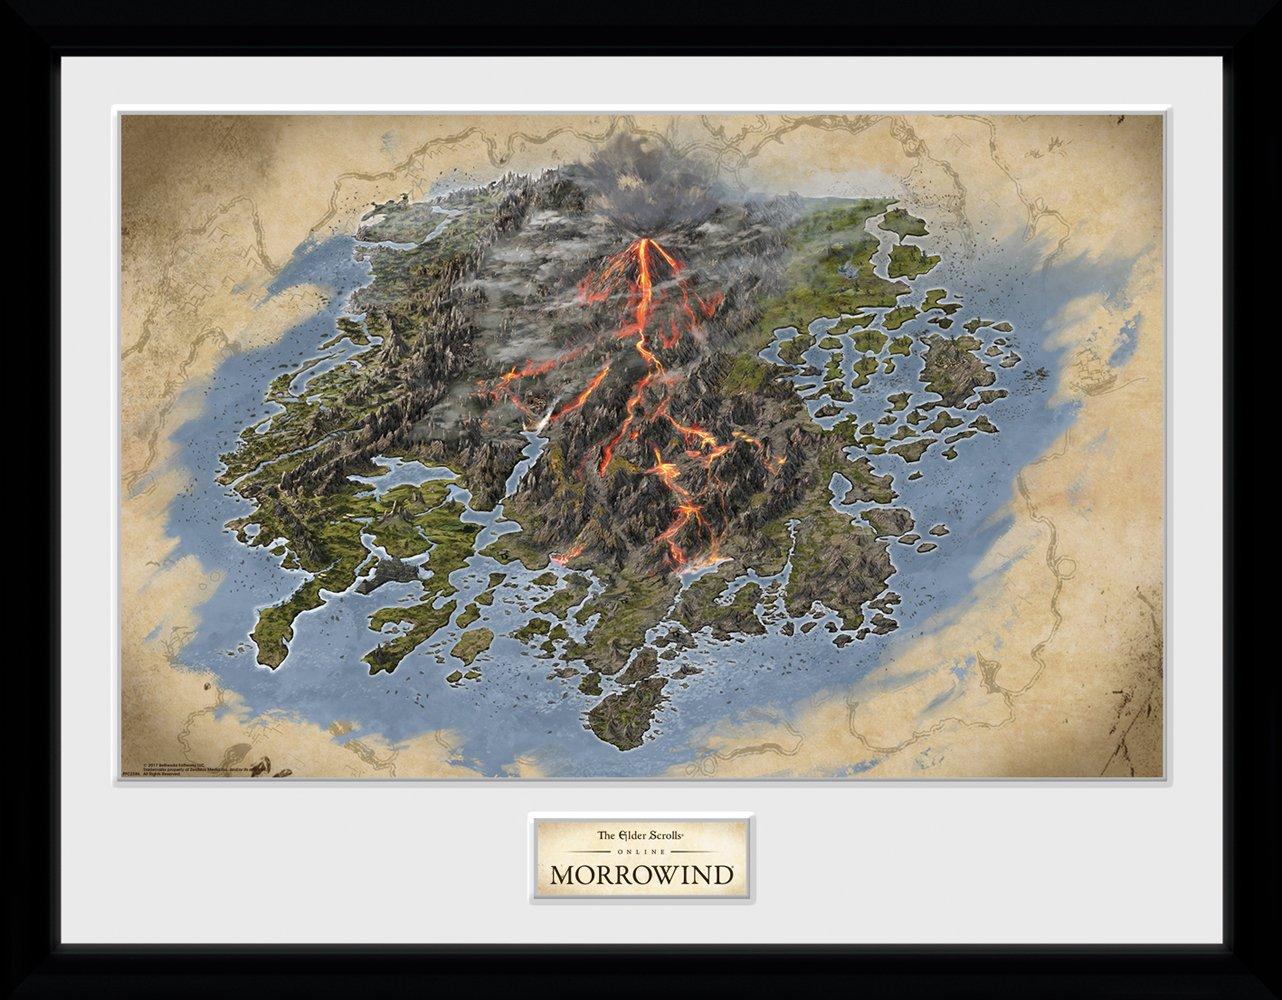 Kaufe Elder Scrolls Online Morrowind Map Framed Collector ...